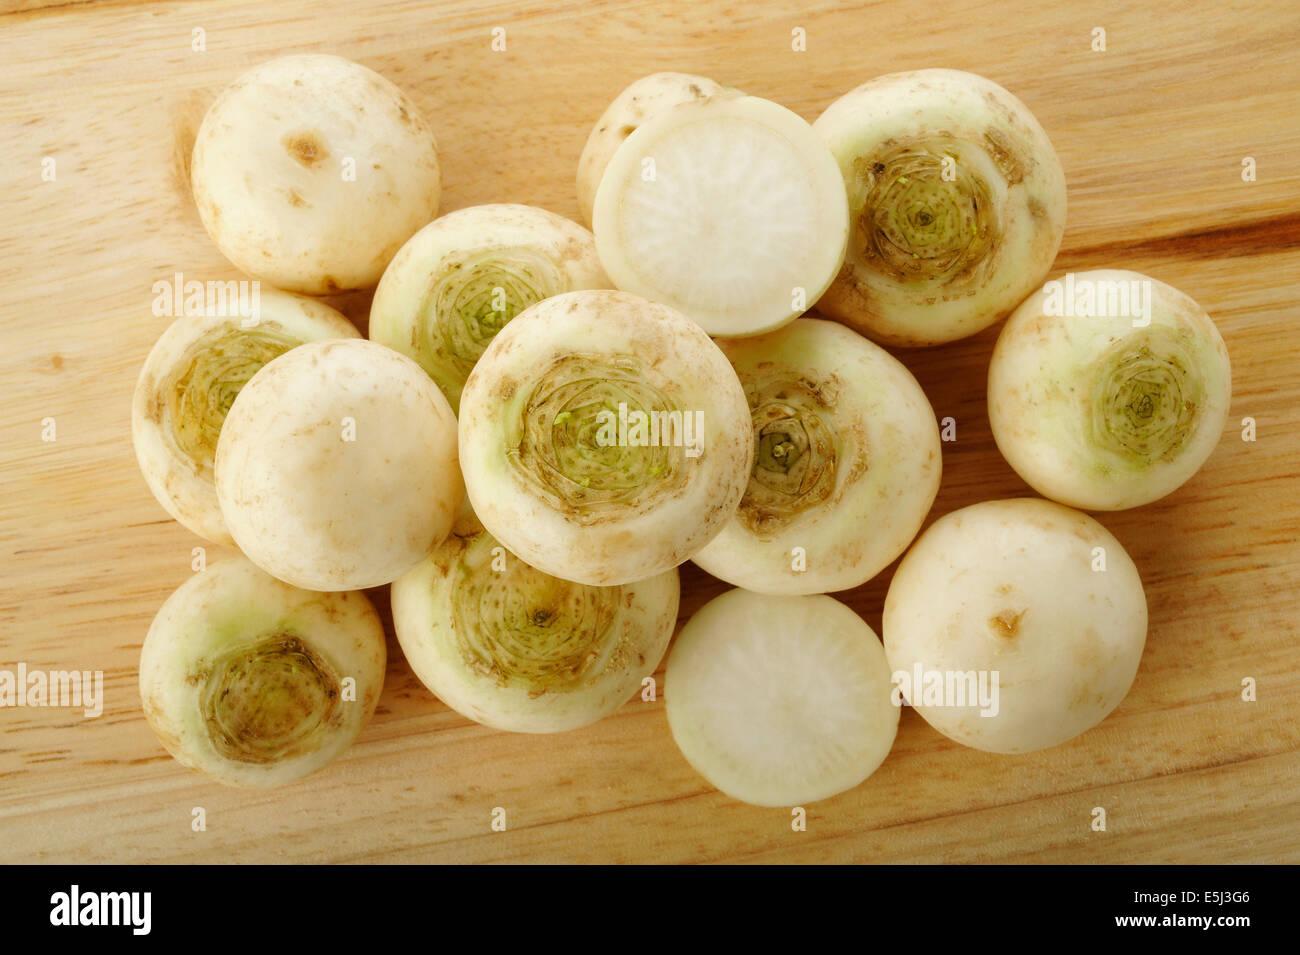 turnip on wooden kitchen board - Stock Image